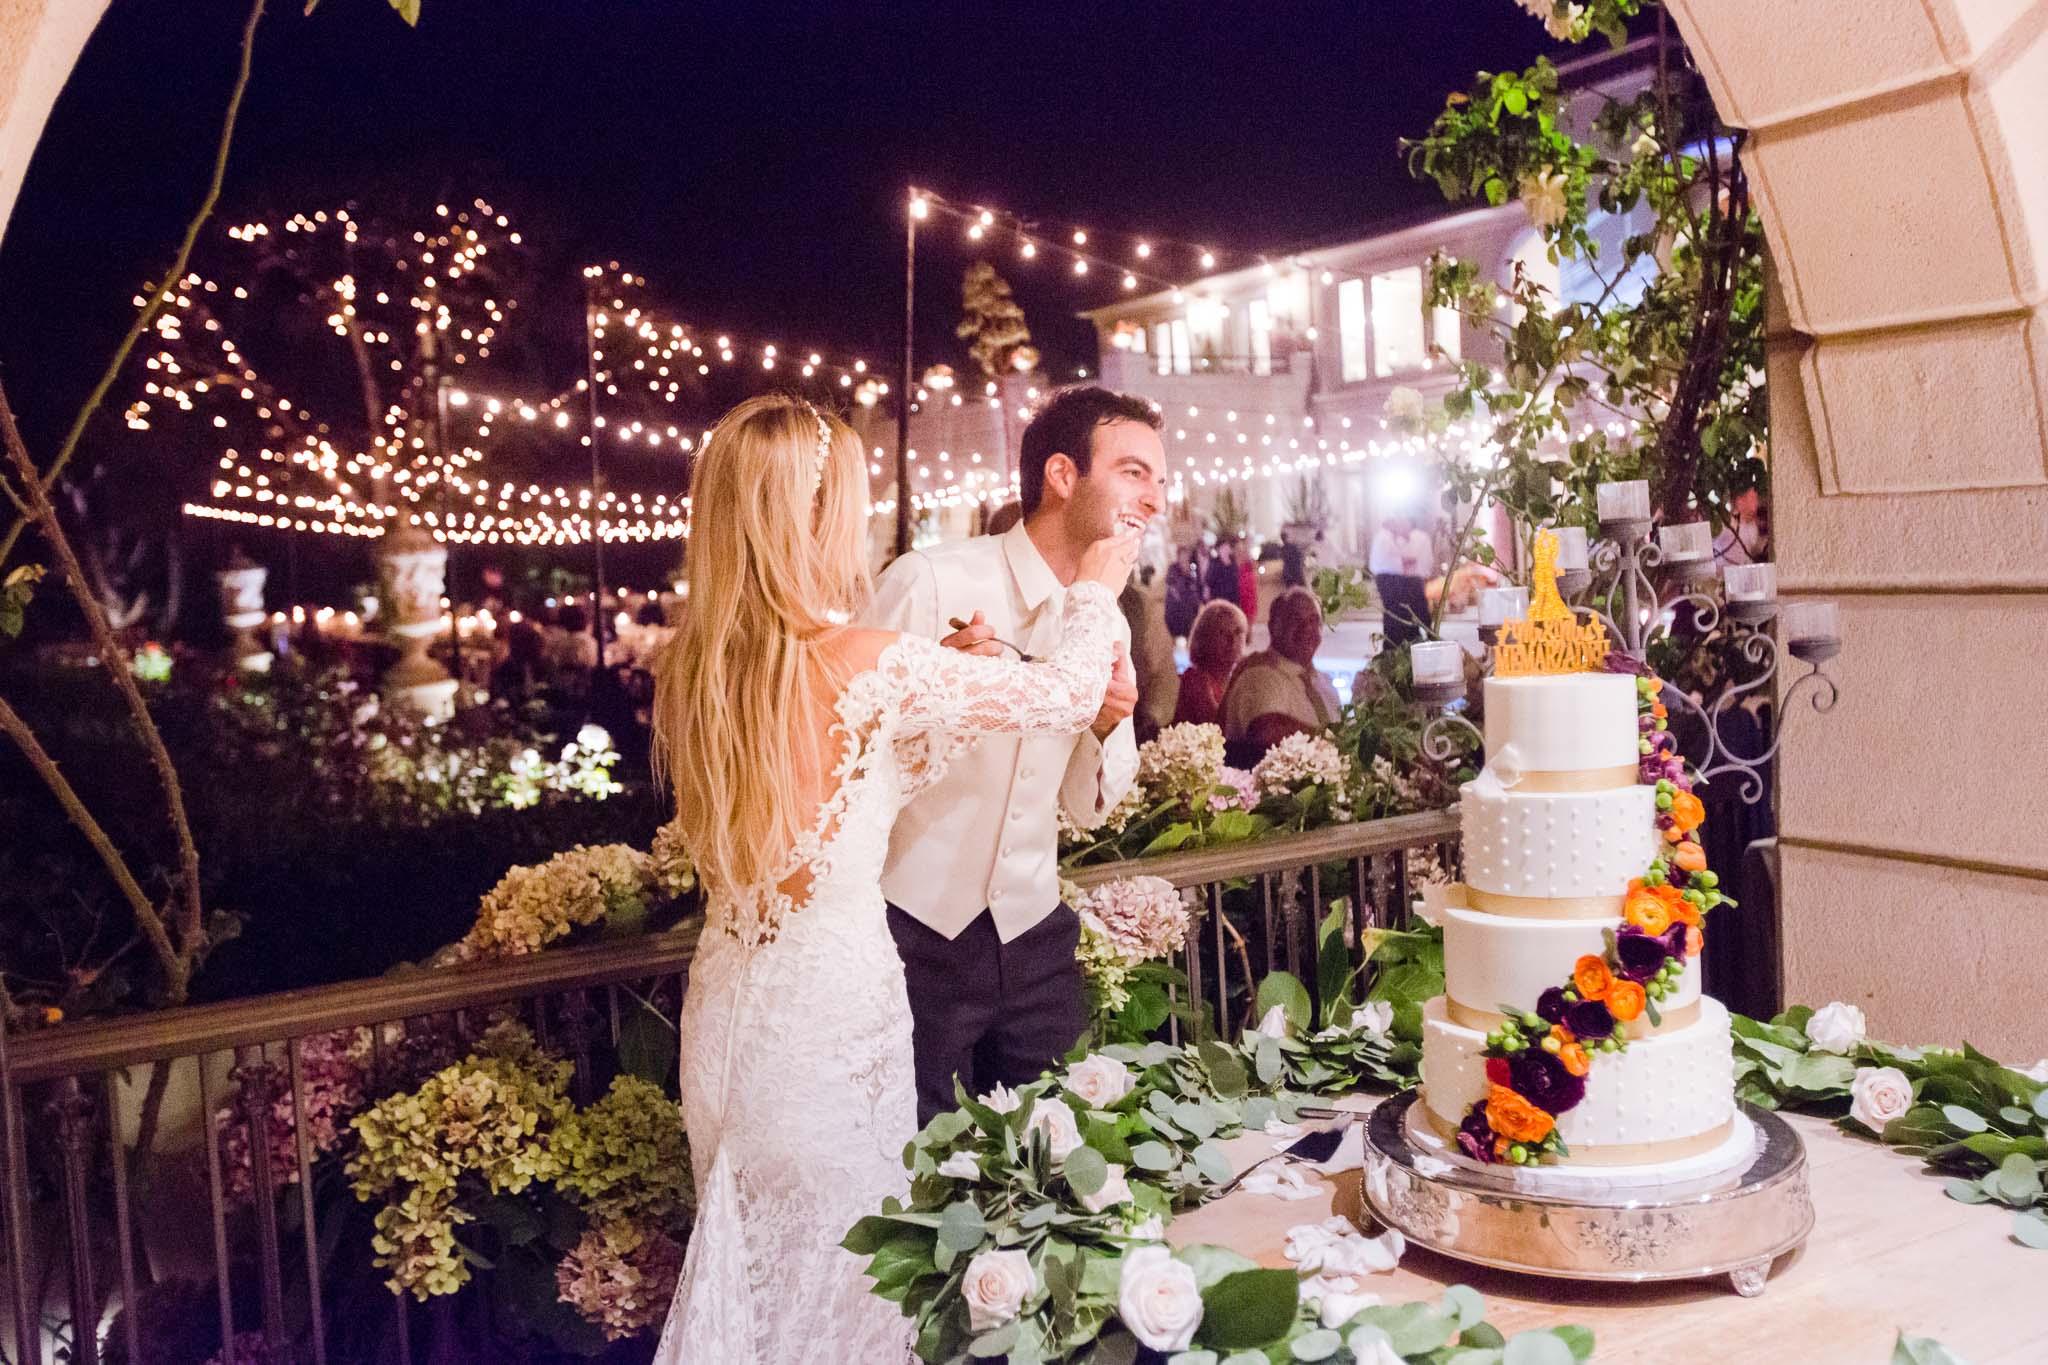 rancho_santa_fe_estate_wedding_171.jpg